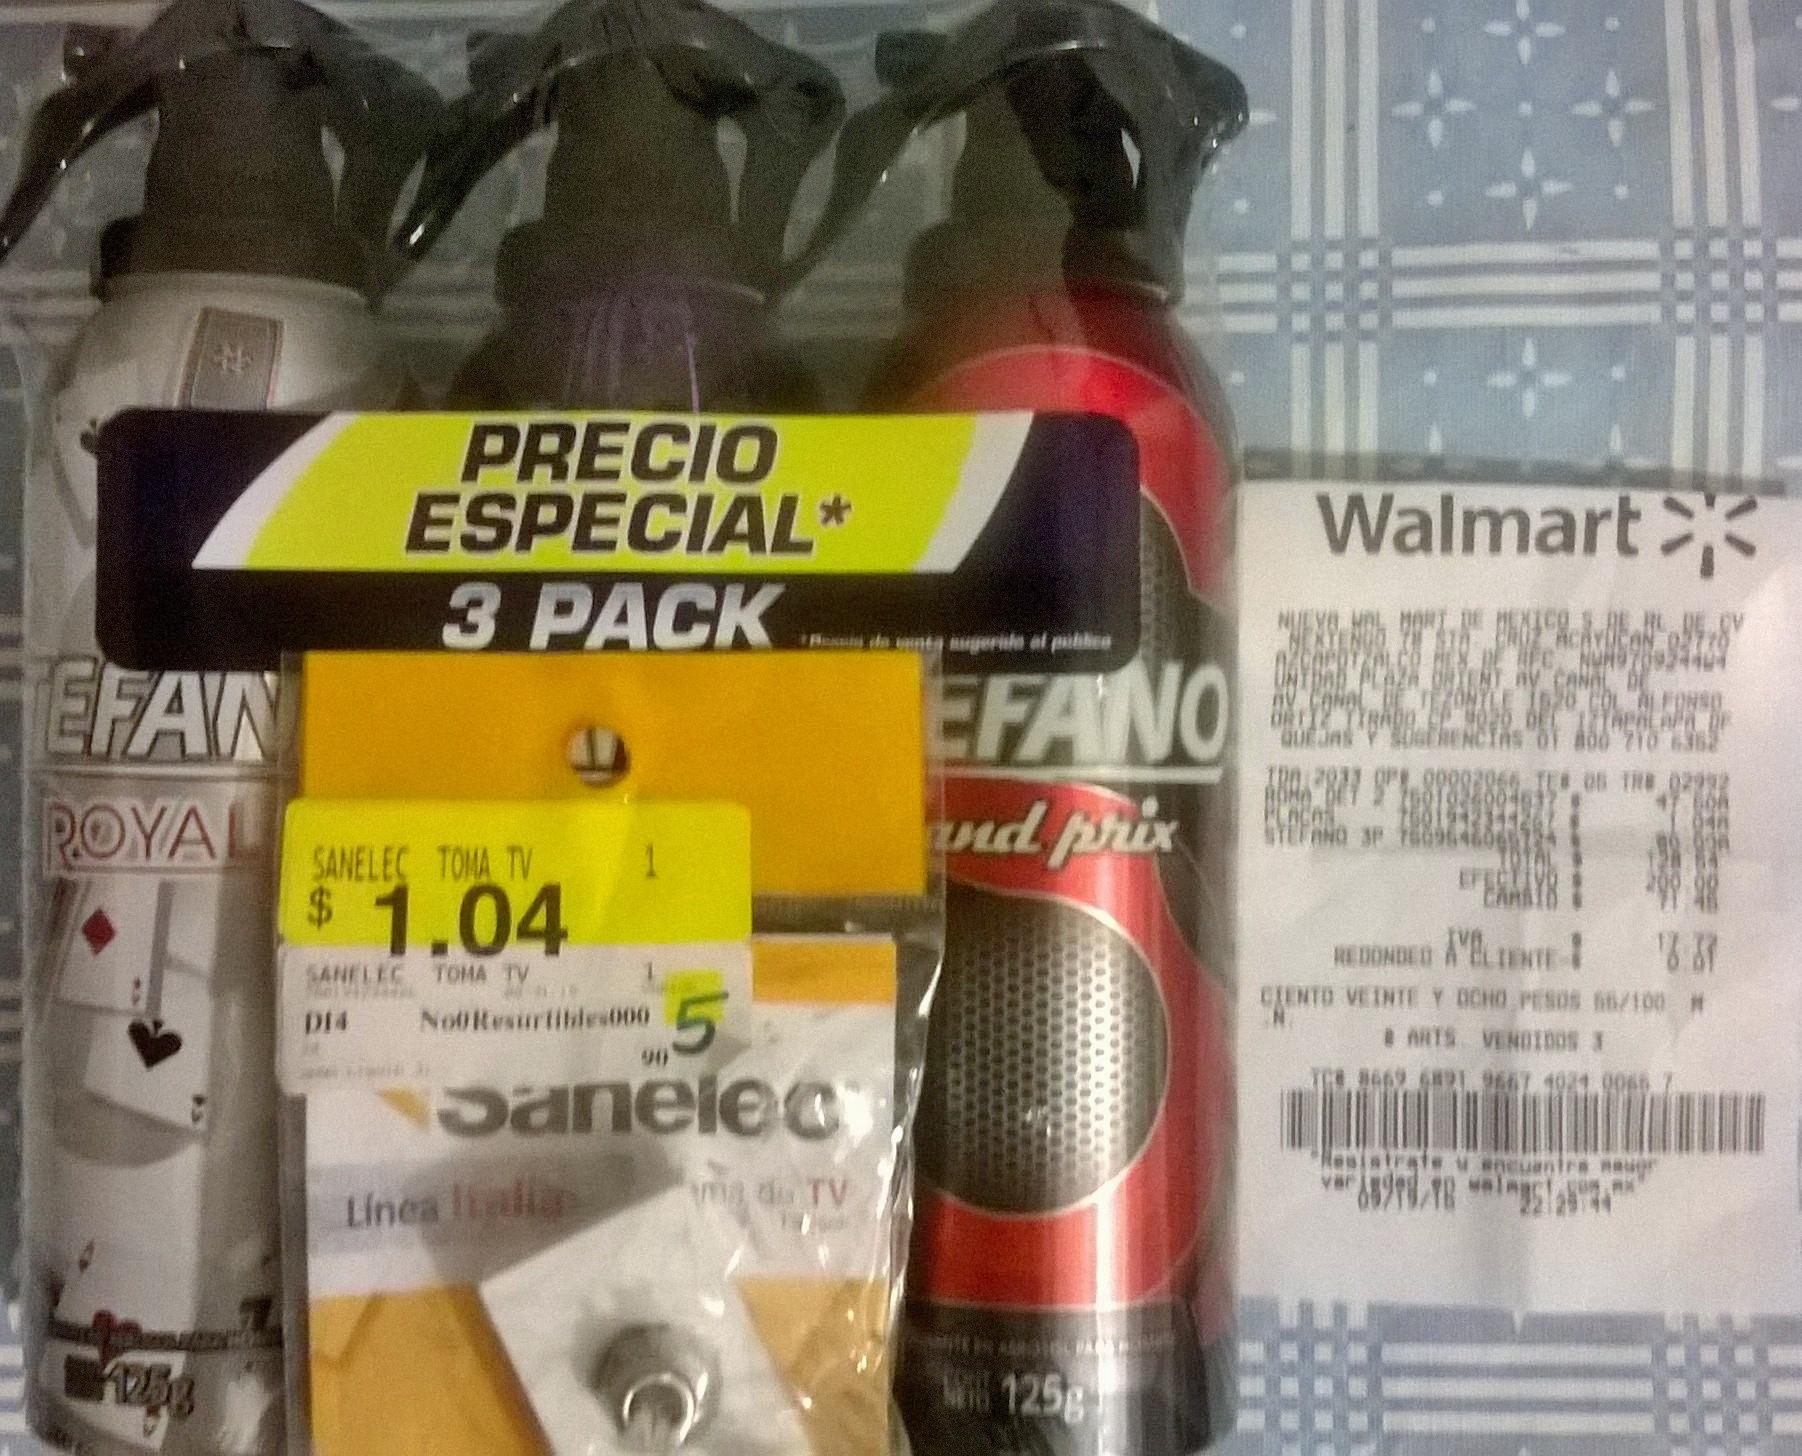 Walmart: Toma Tv $1.04 , Desorante Estefano 3 x $80